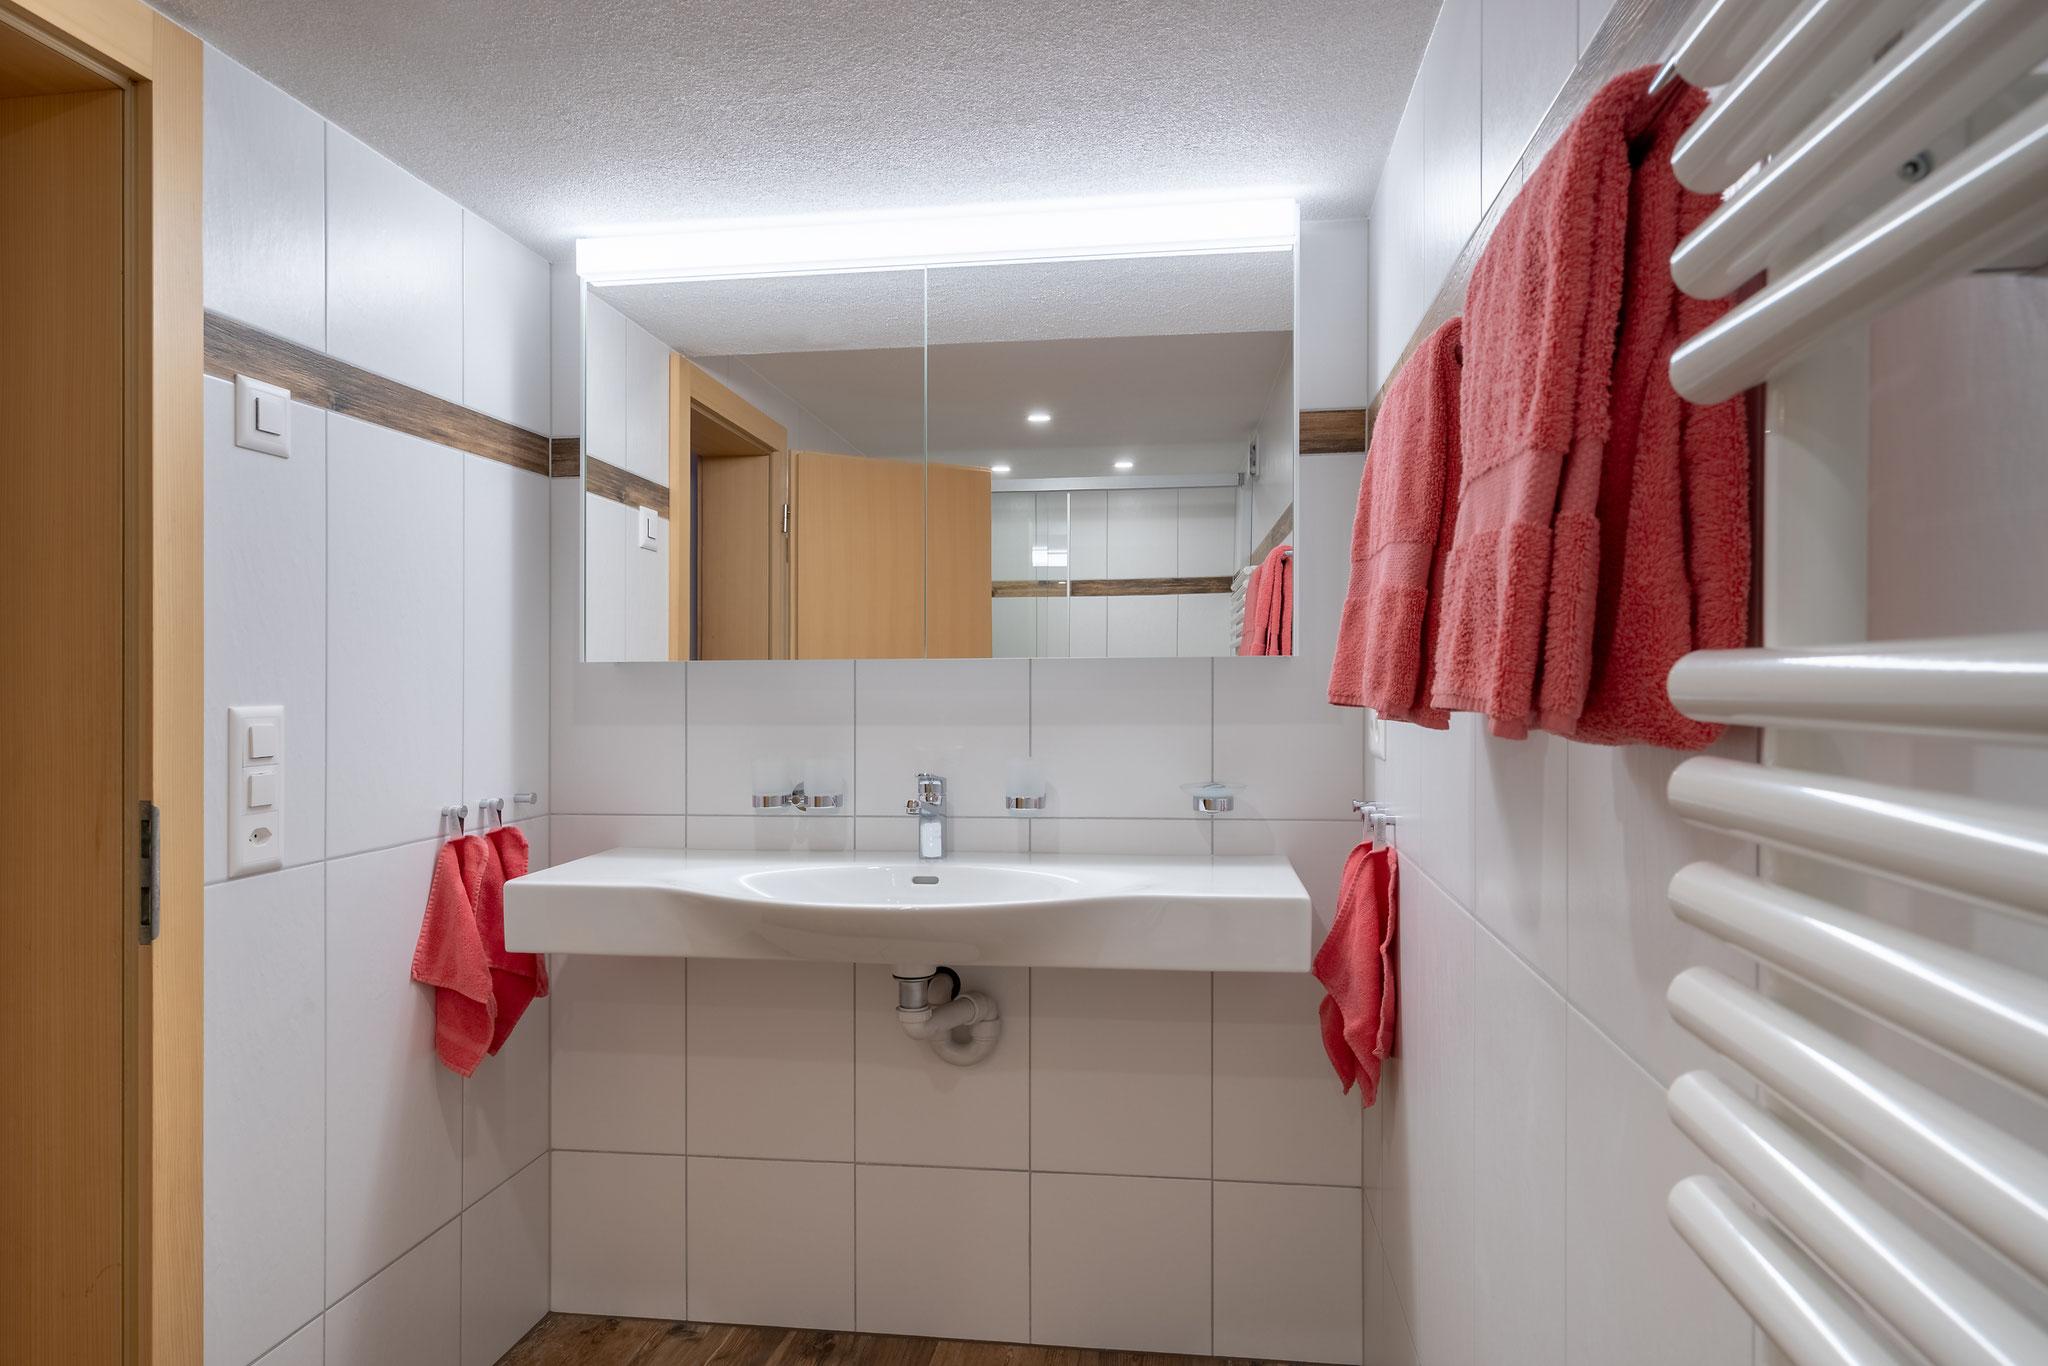 Badezimmer mit grossem Lavabo - neu Februar 2019